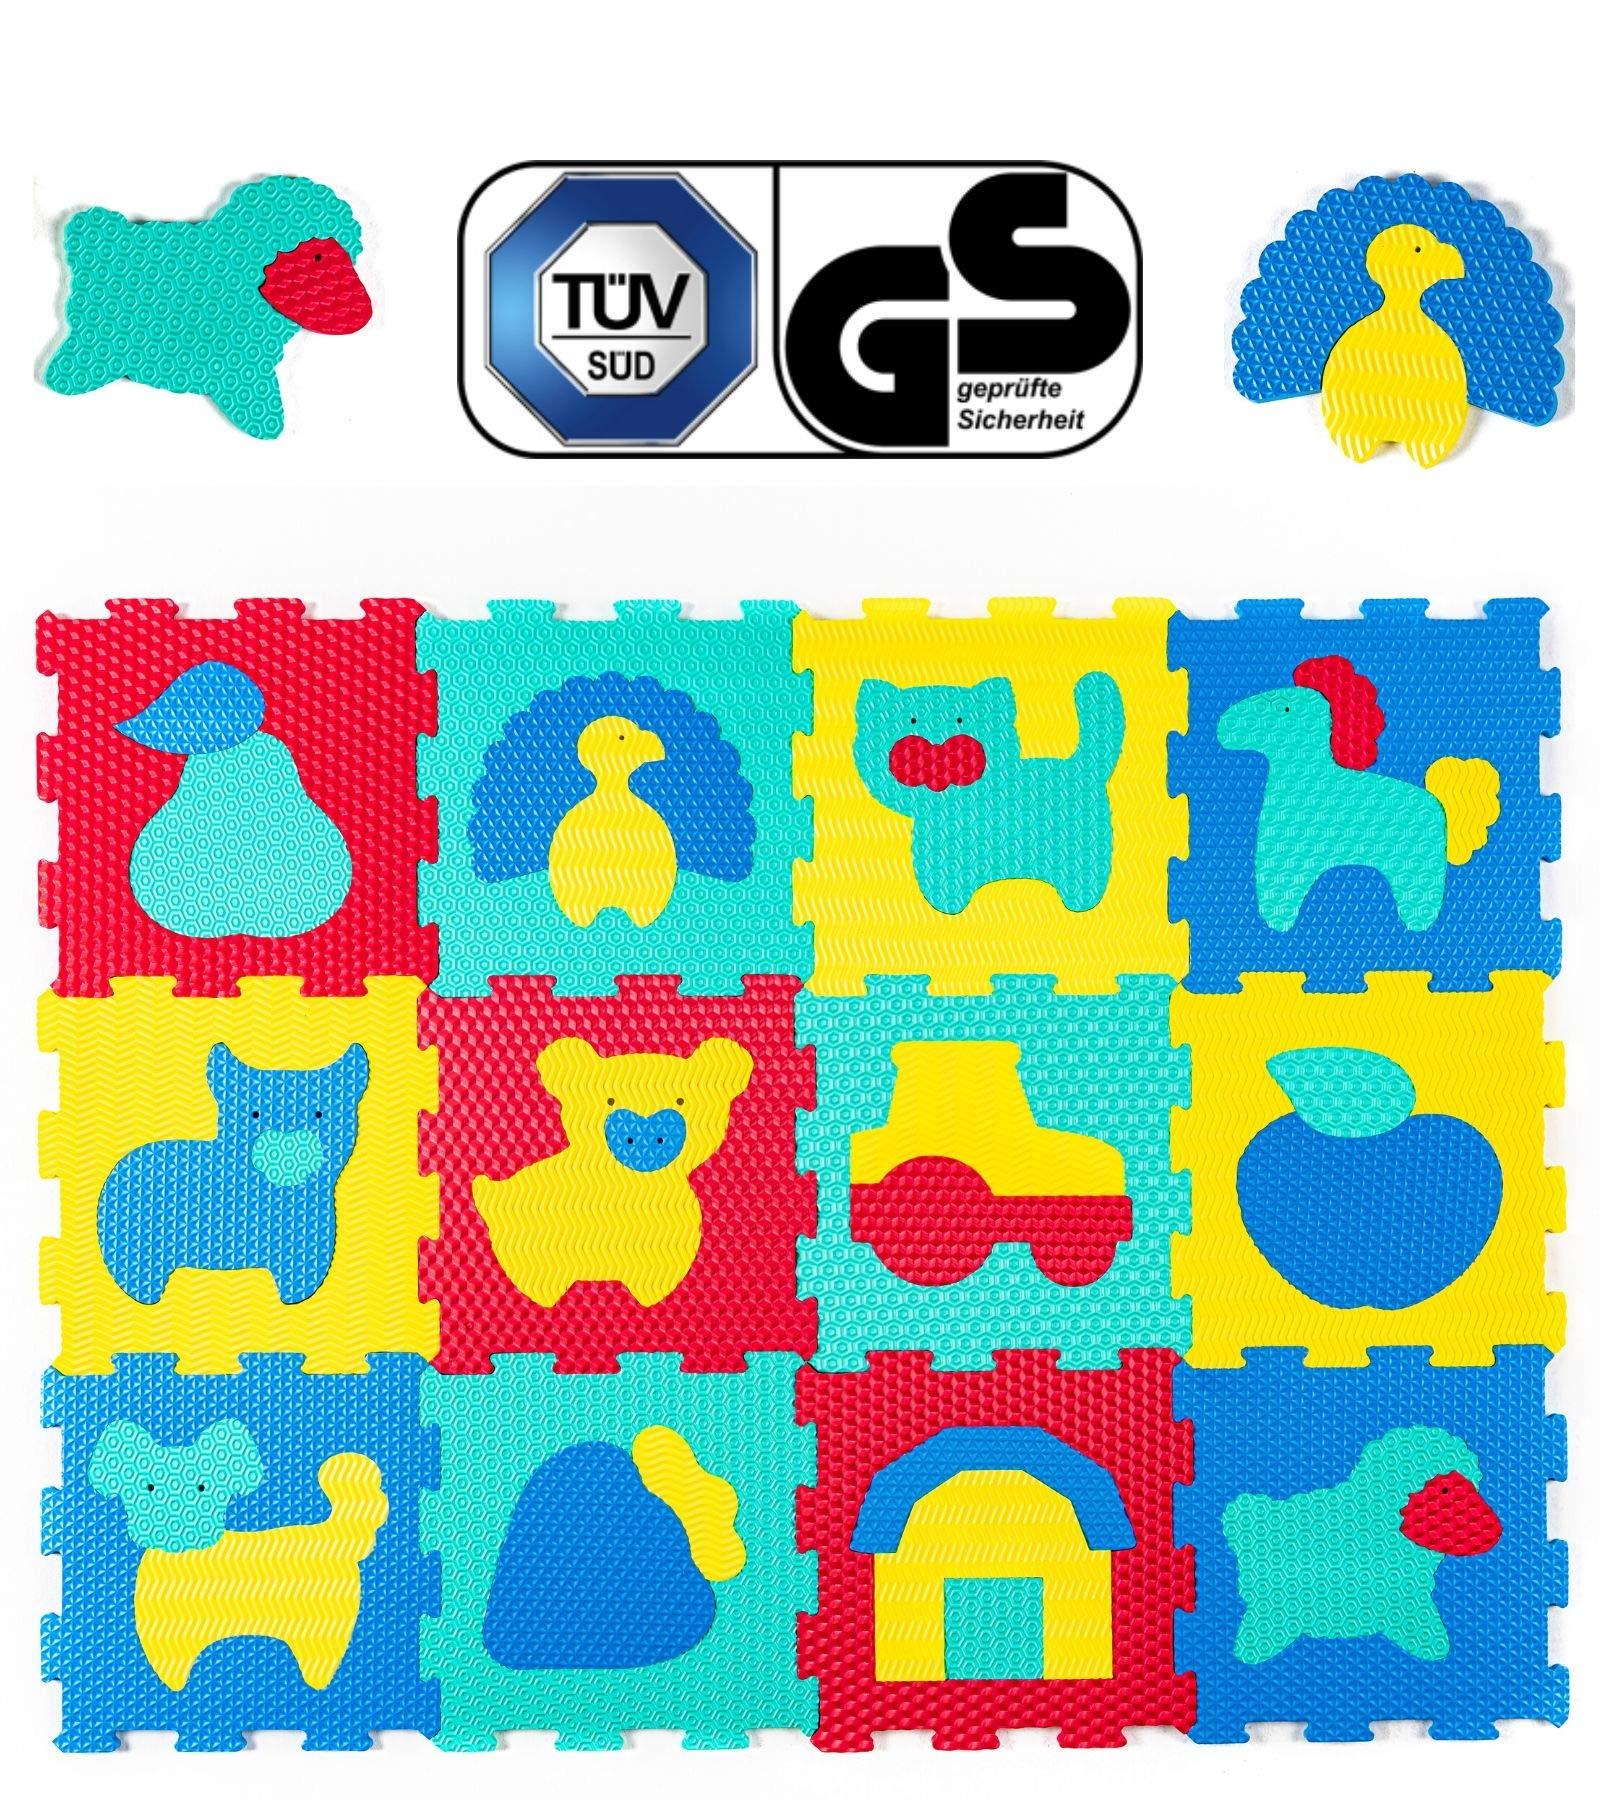 Large Interlocking Floor Kids Puzzle Mat Tiles Set 12PCS 120x90CM Indoor Outdoor Zoo Animals Jigsaw Playmats Play Gym Soft Rug Baby Crawl Mats Play Mat for Children Foam Mats UK Company